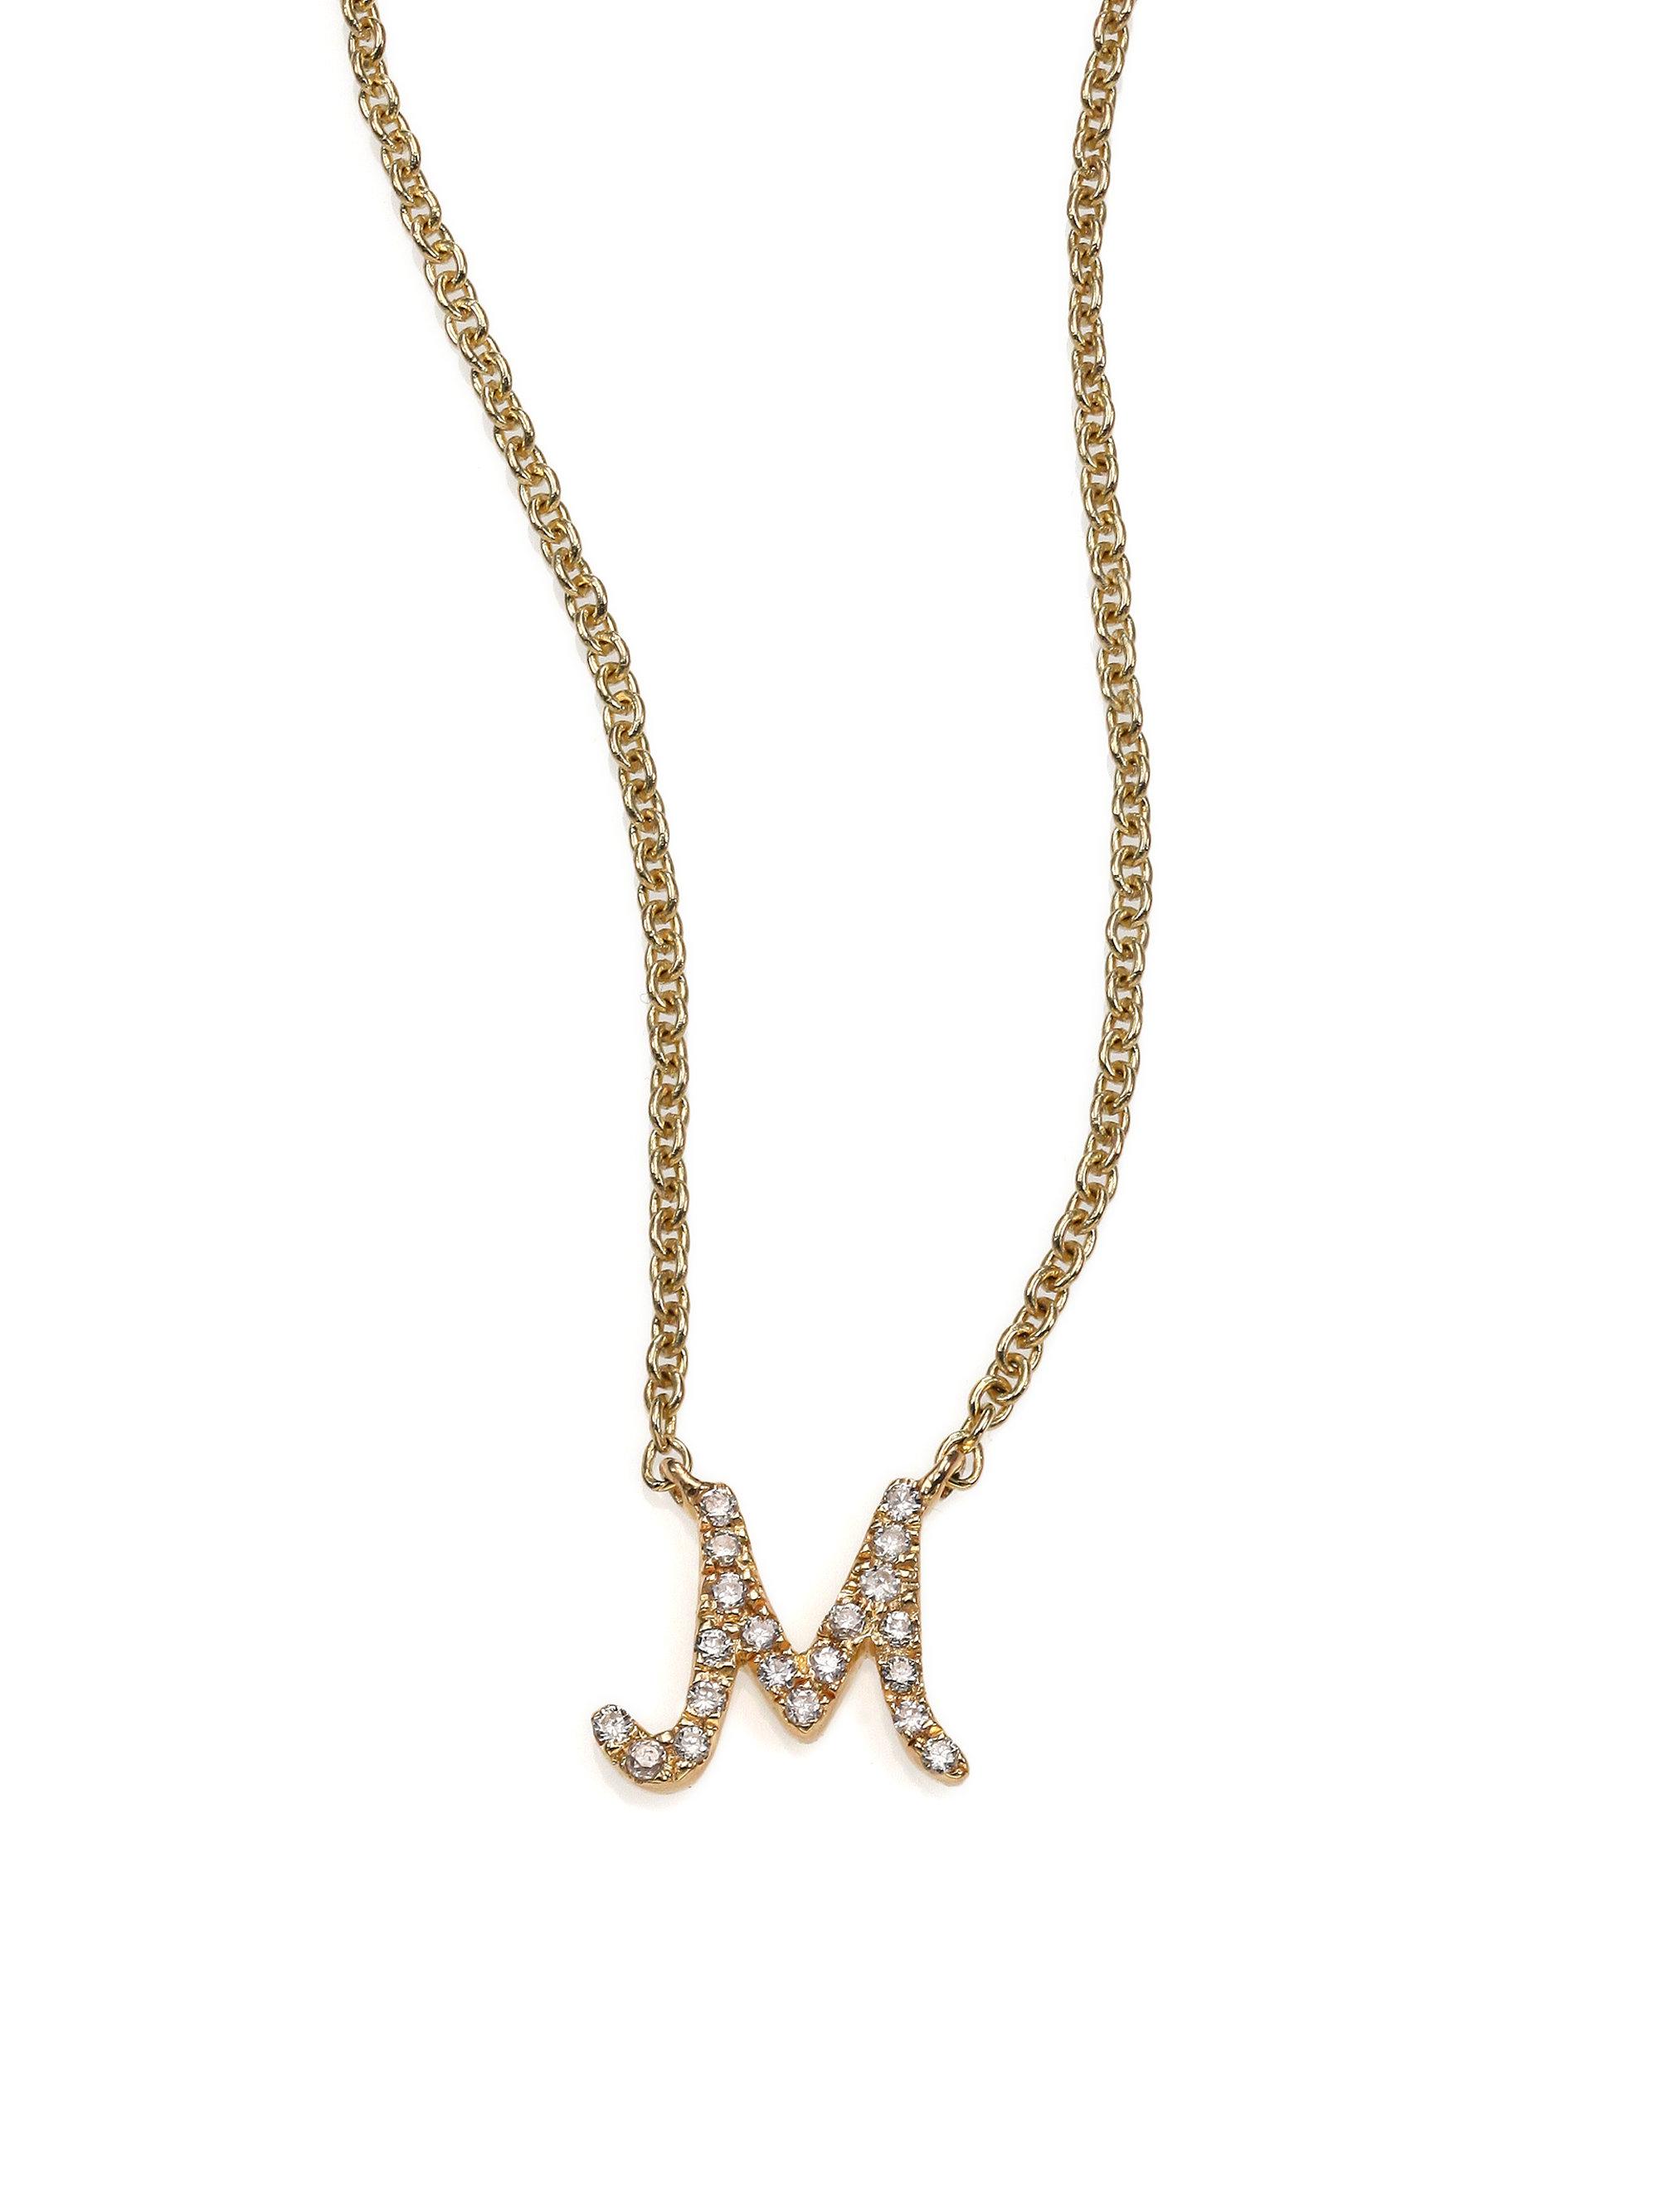 Sydney Evan Diamond E Necklace - Metallic 07pDq